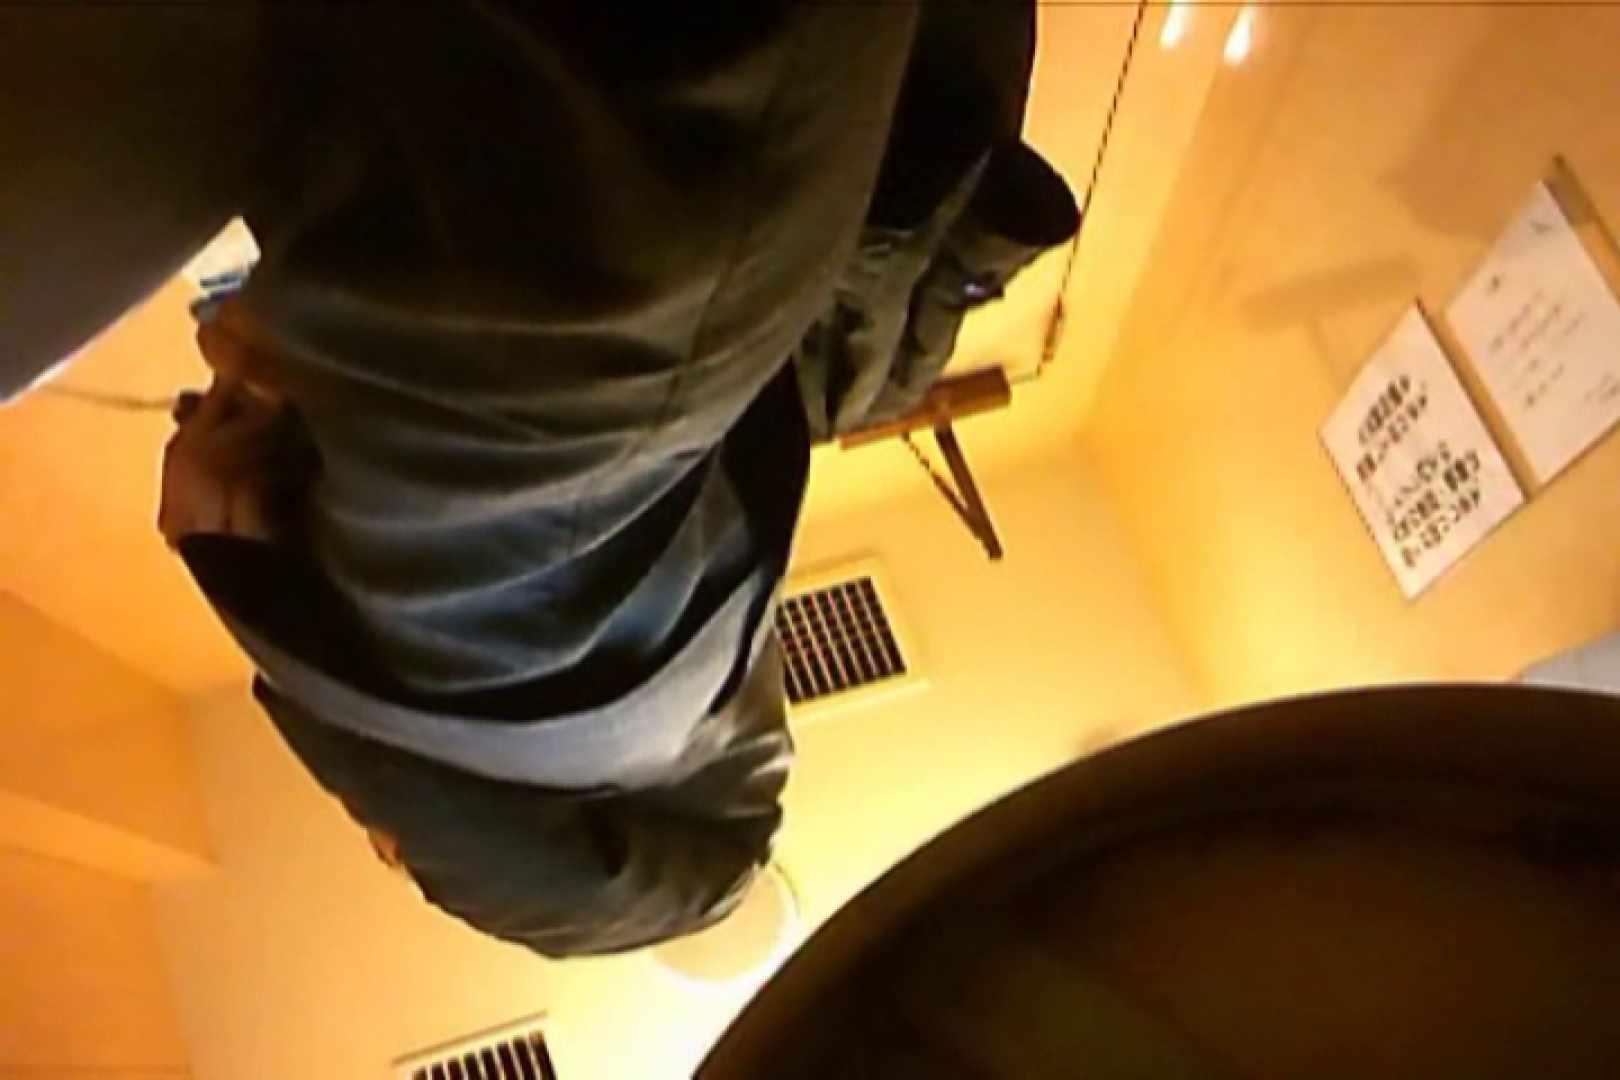 SEASON 2ND!掴み取りさんの洗面所覗き!in新幹線!VOL.13 リーマン系ボーイズ | 人気シリーズ  80pic 42